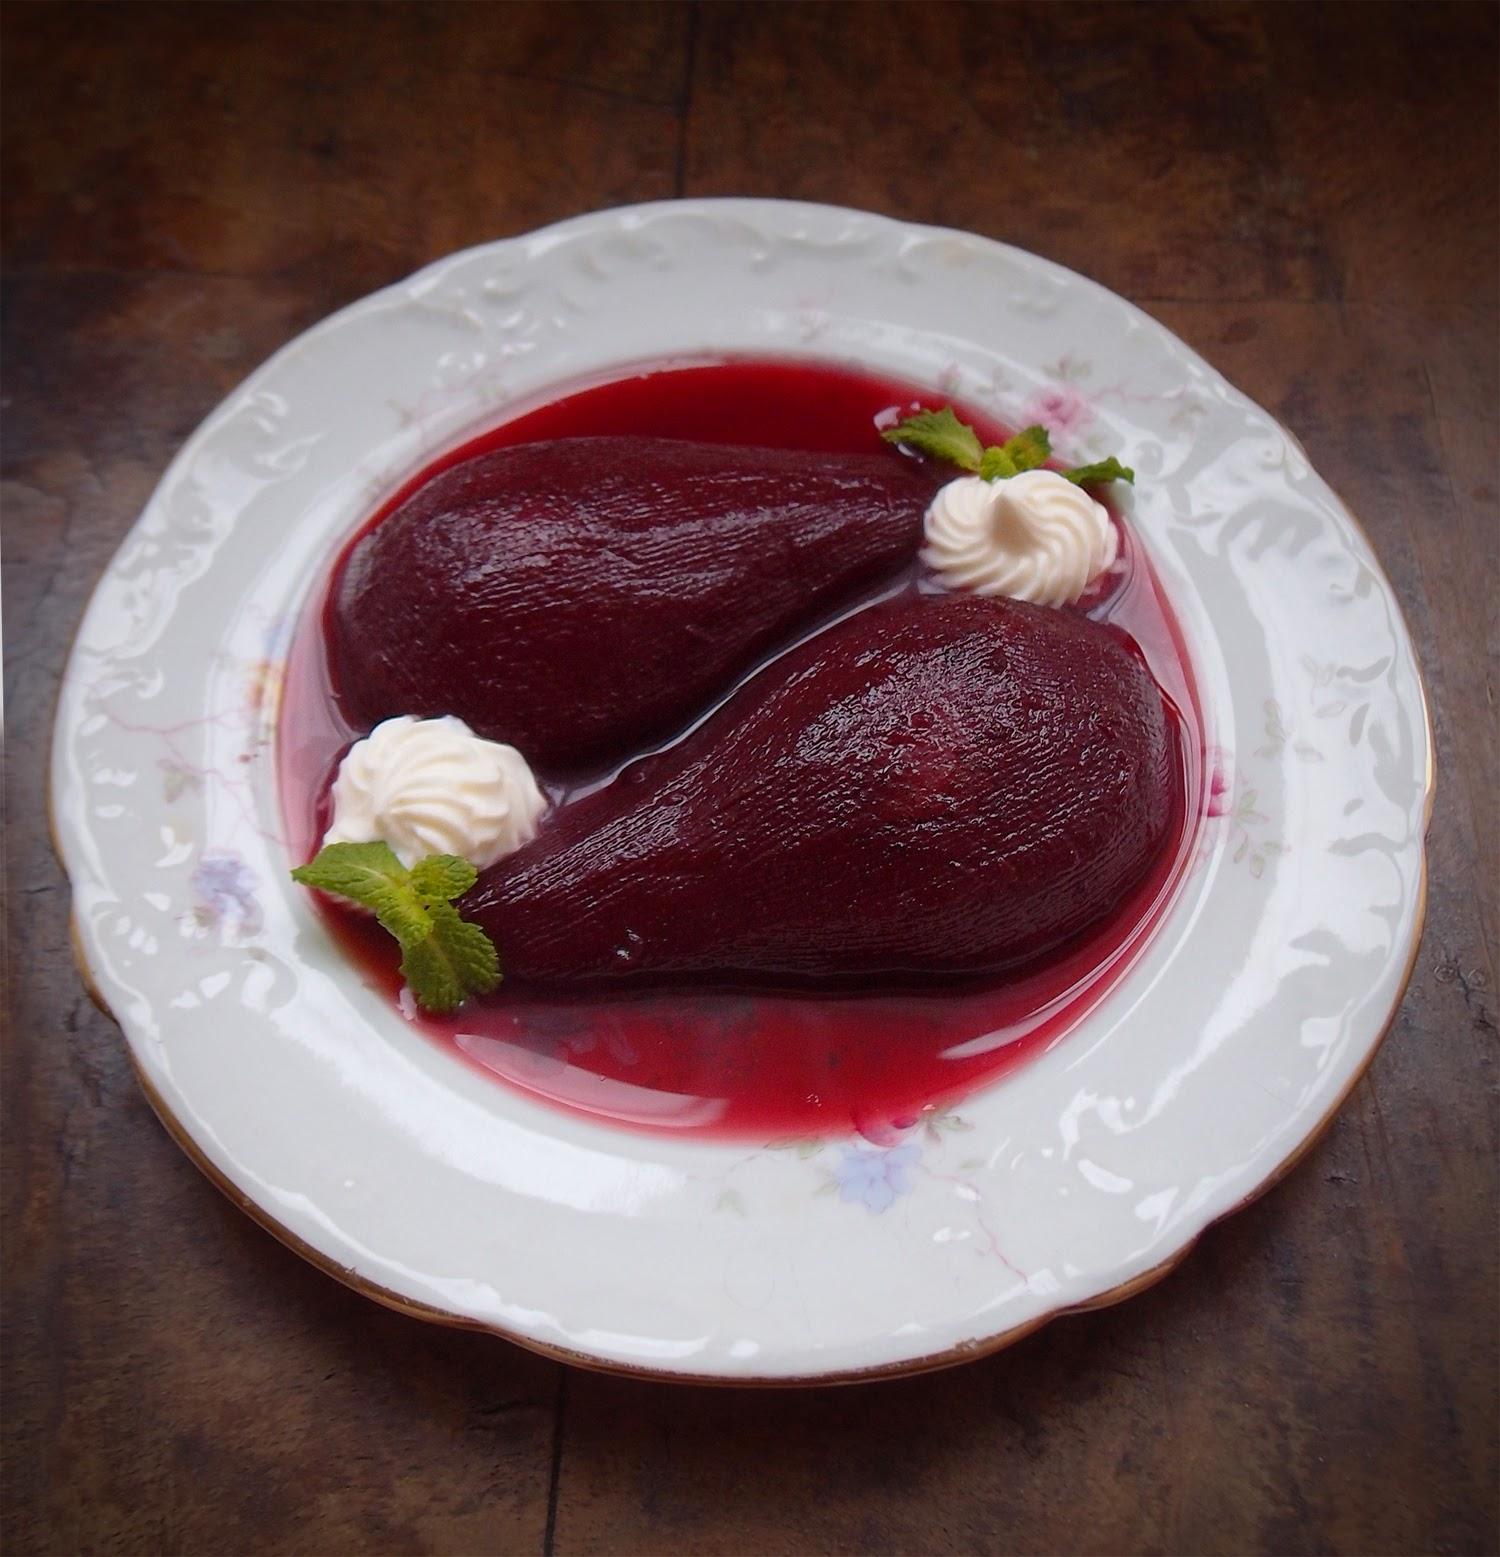 Çikolata Soslu Armut Tatlısı Tarifi